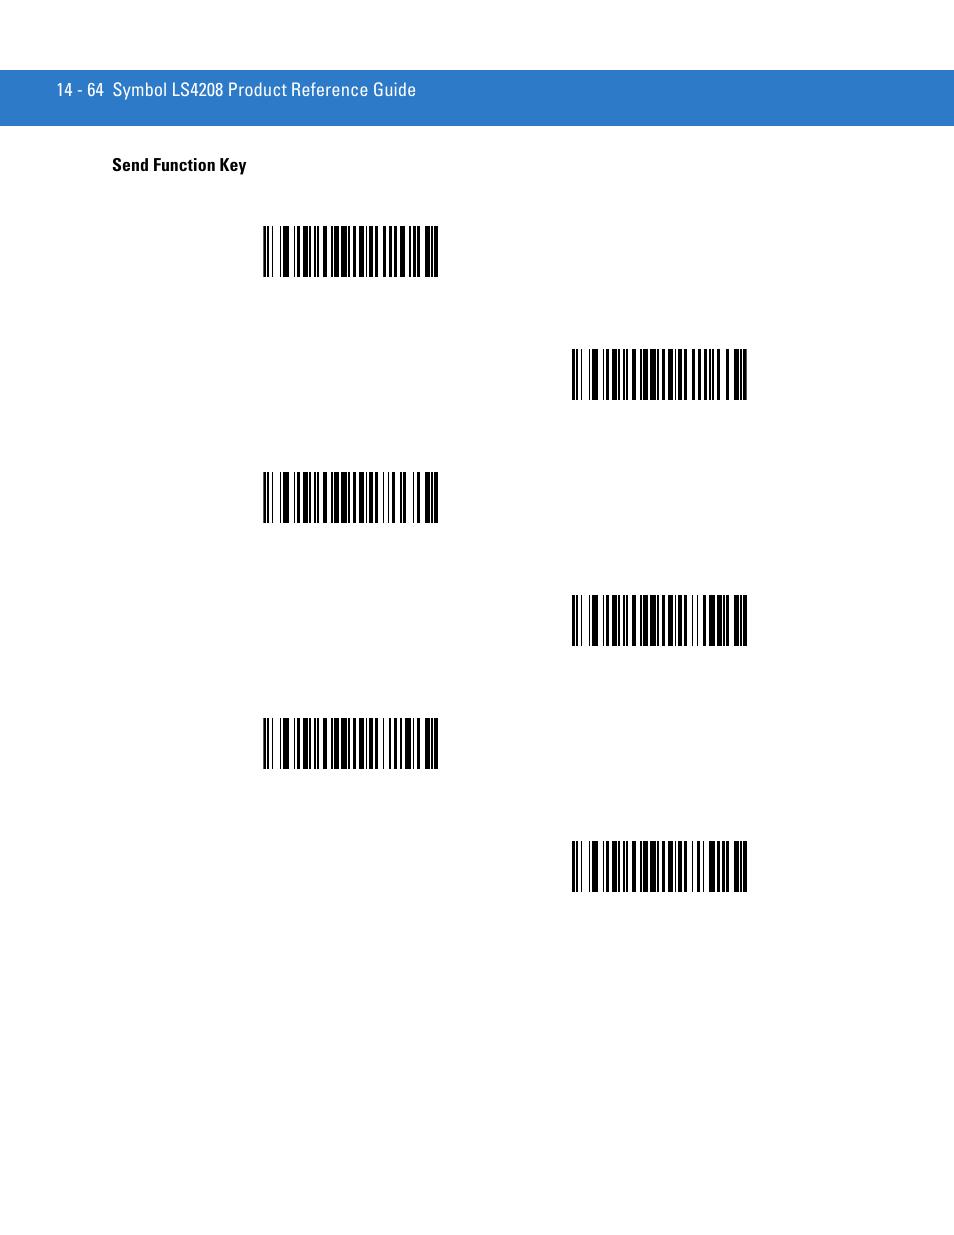 send function key send function key 64 motorola ls4208 user rh manualsdir com Symbol LS3578 symbol ls4208 product reference guide